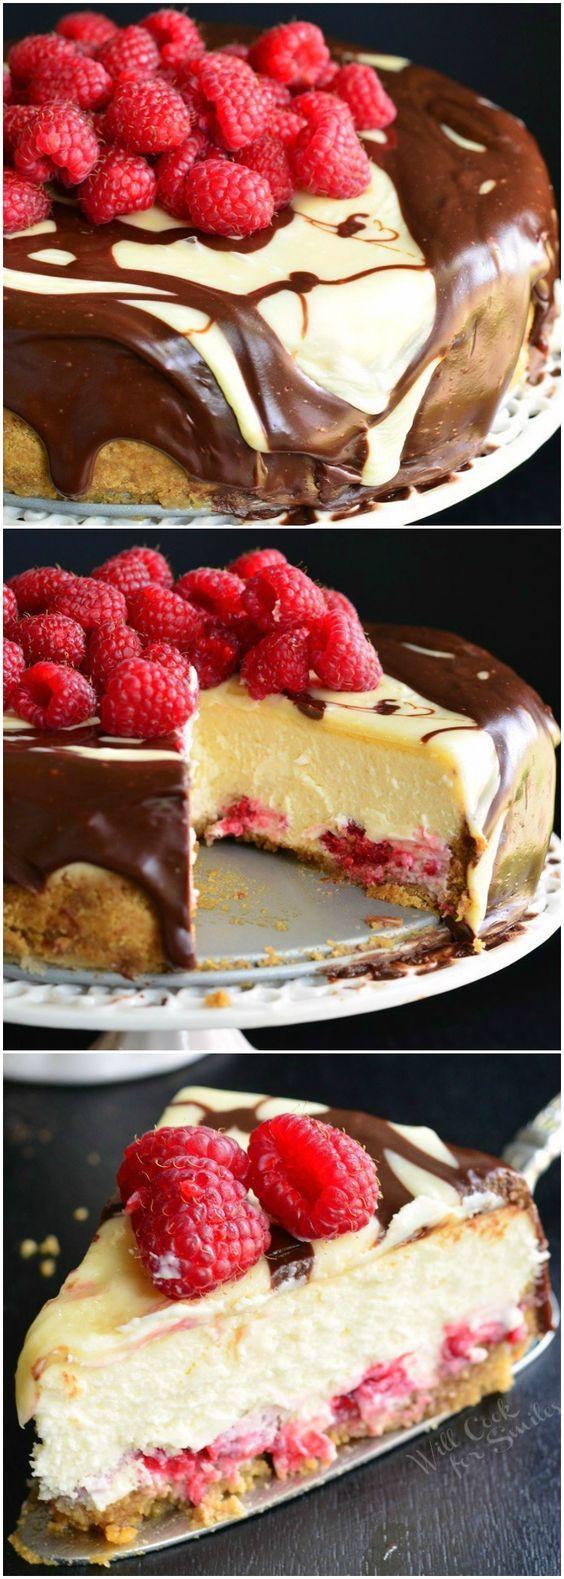 Double Chocolate Ganache and Raspberry Cheesecake